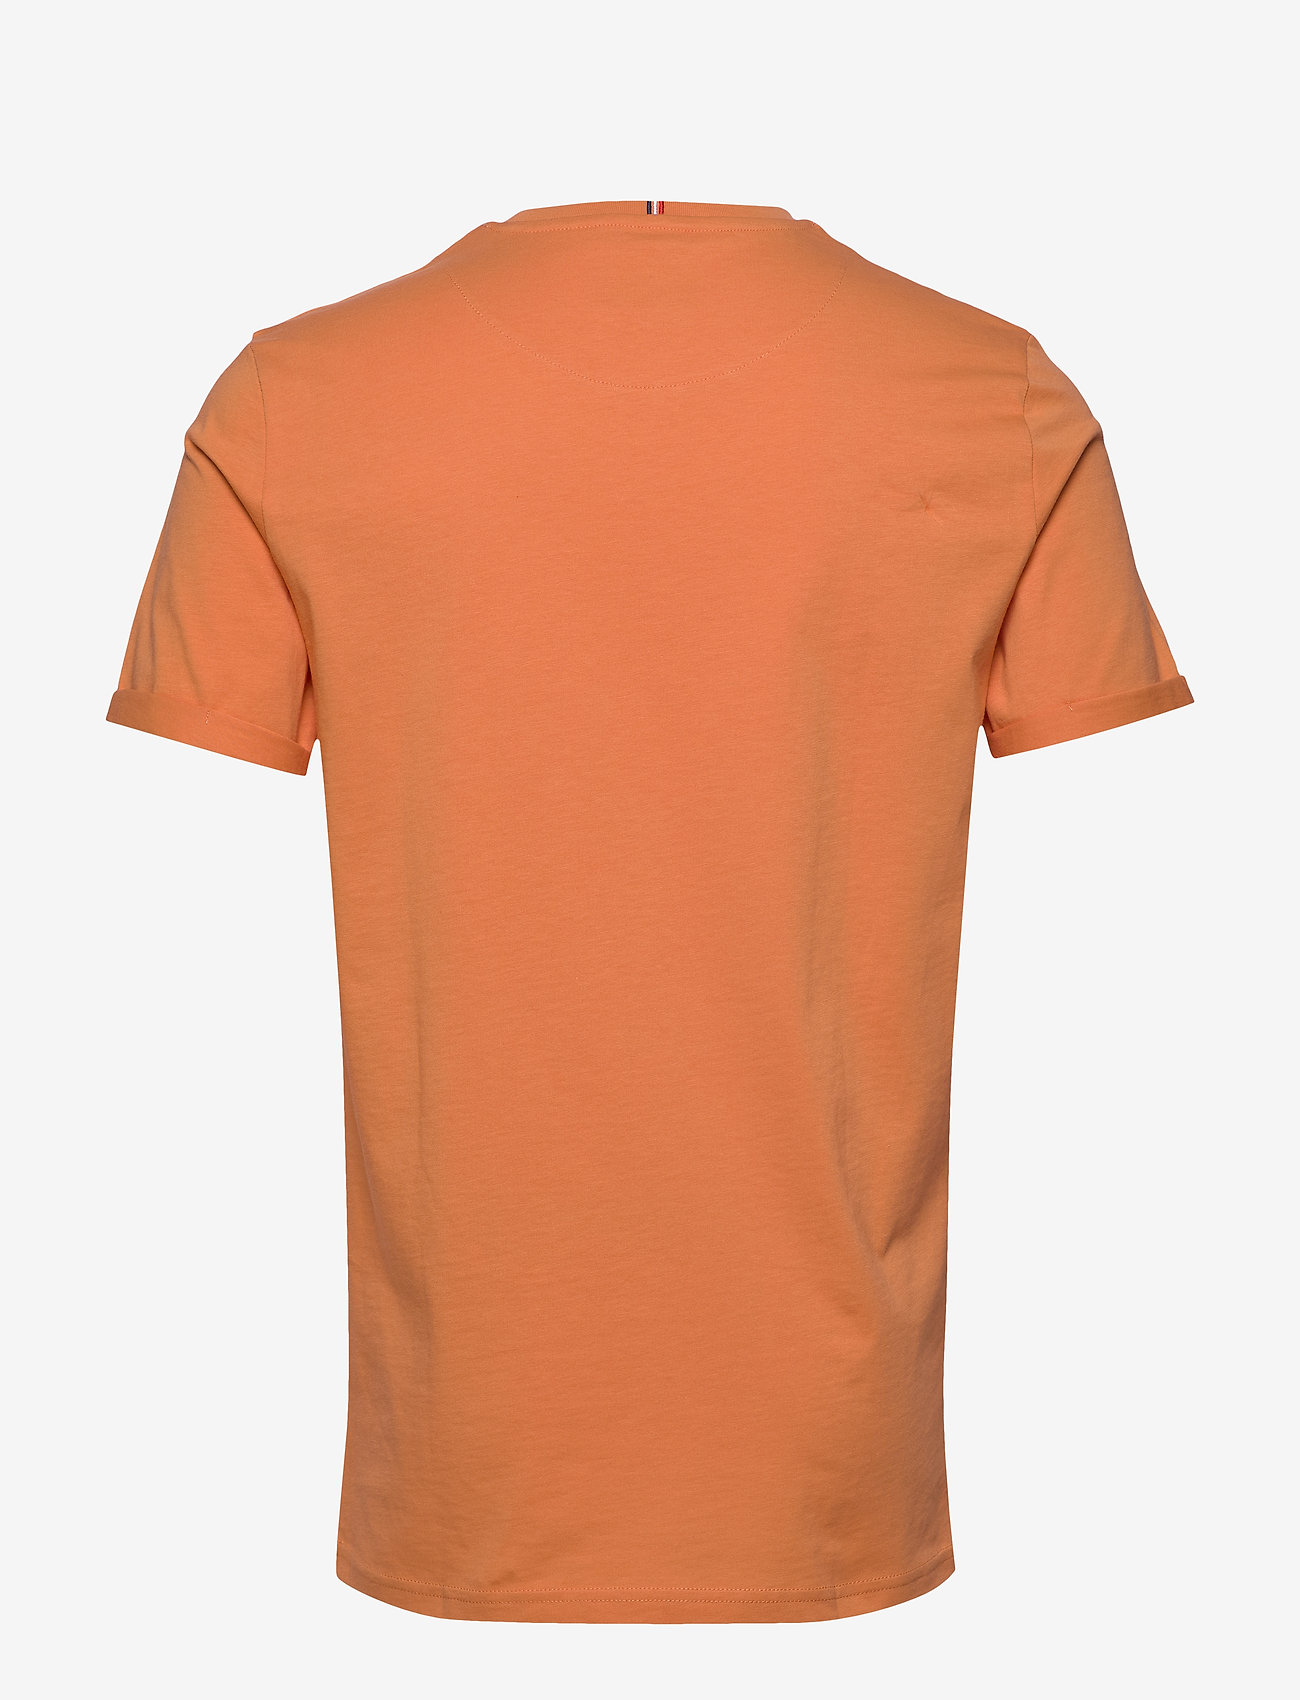 Les Deux Nørregaard T-Shirt - T-skjorter DARK PAPAYA/ORANGE - Menn Klær